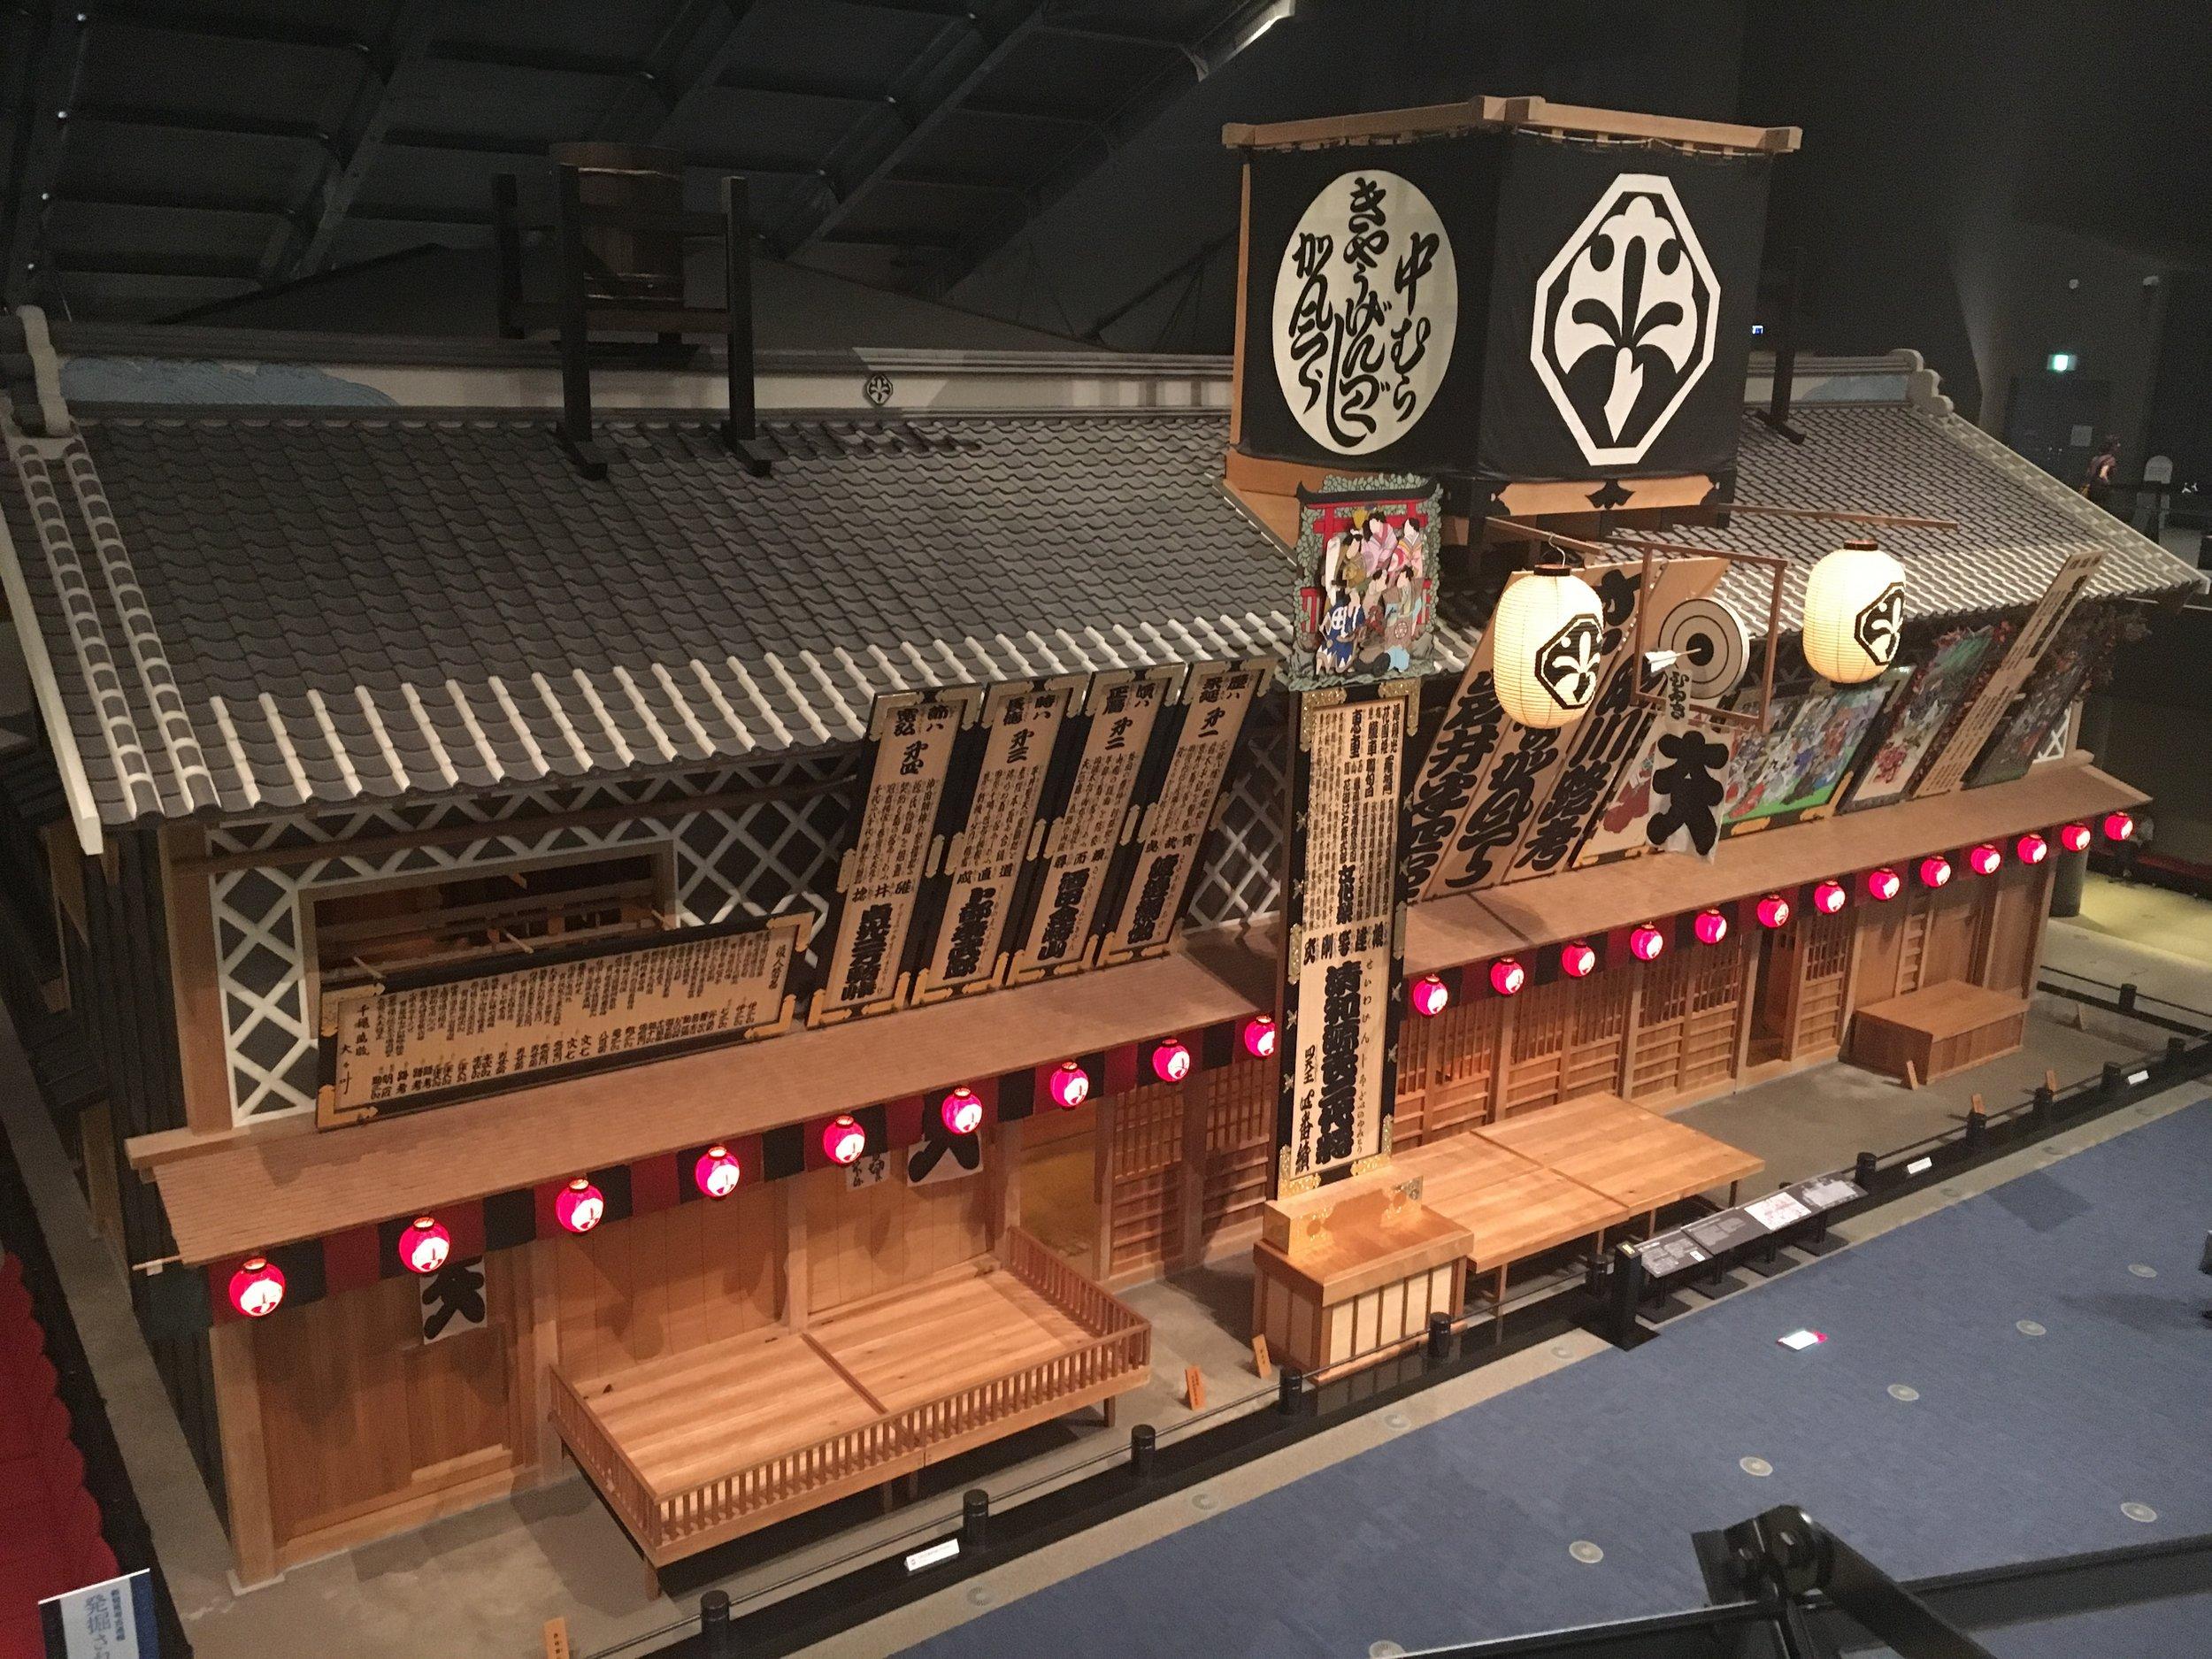 FULL SCALE Kabuki Theatre. It's HUGE!